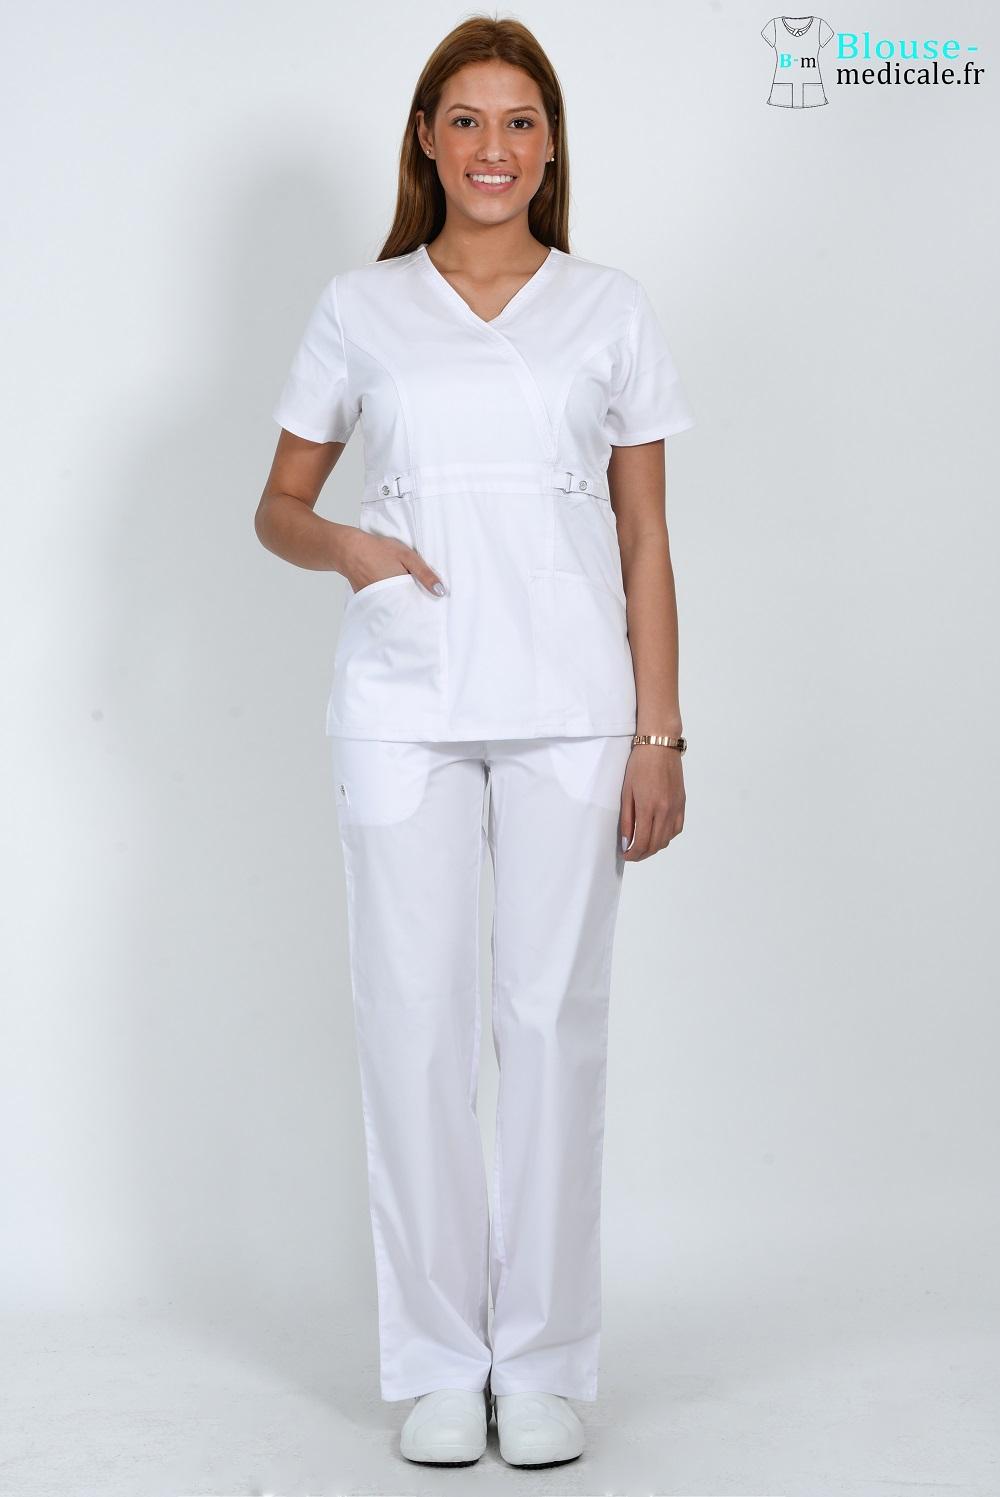 tenue médicale femme cherokee luxe tenue medicale femme blanc